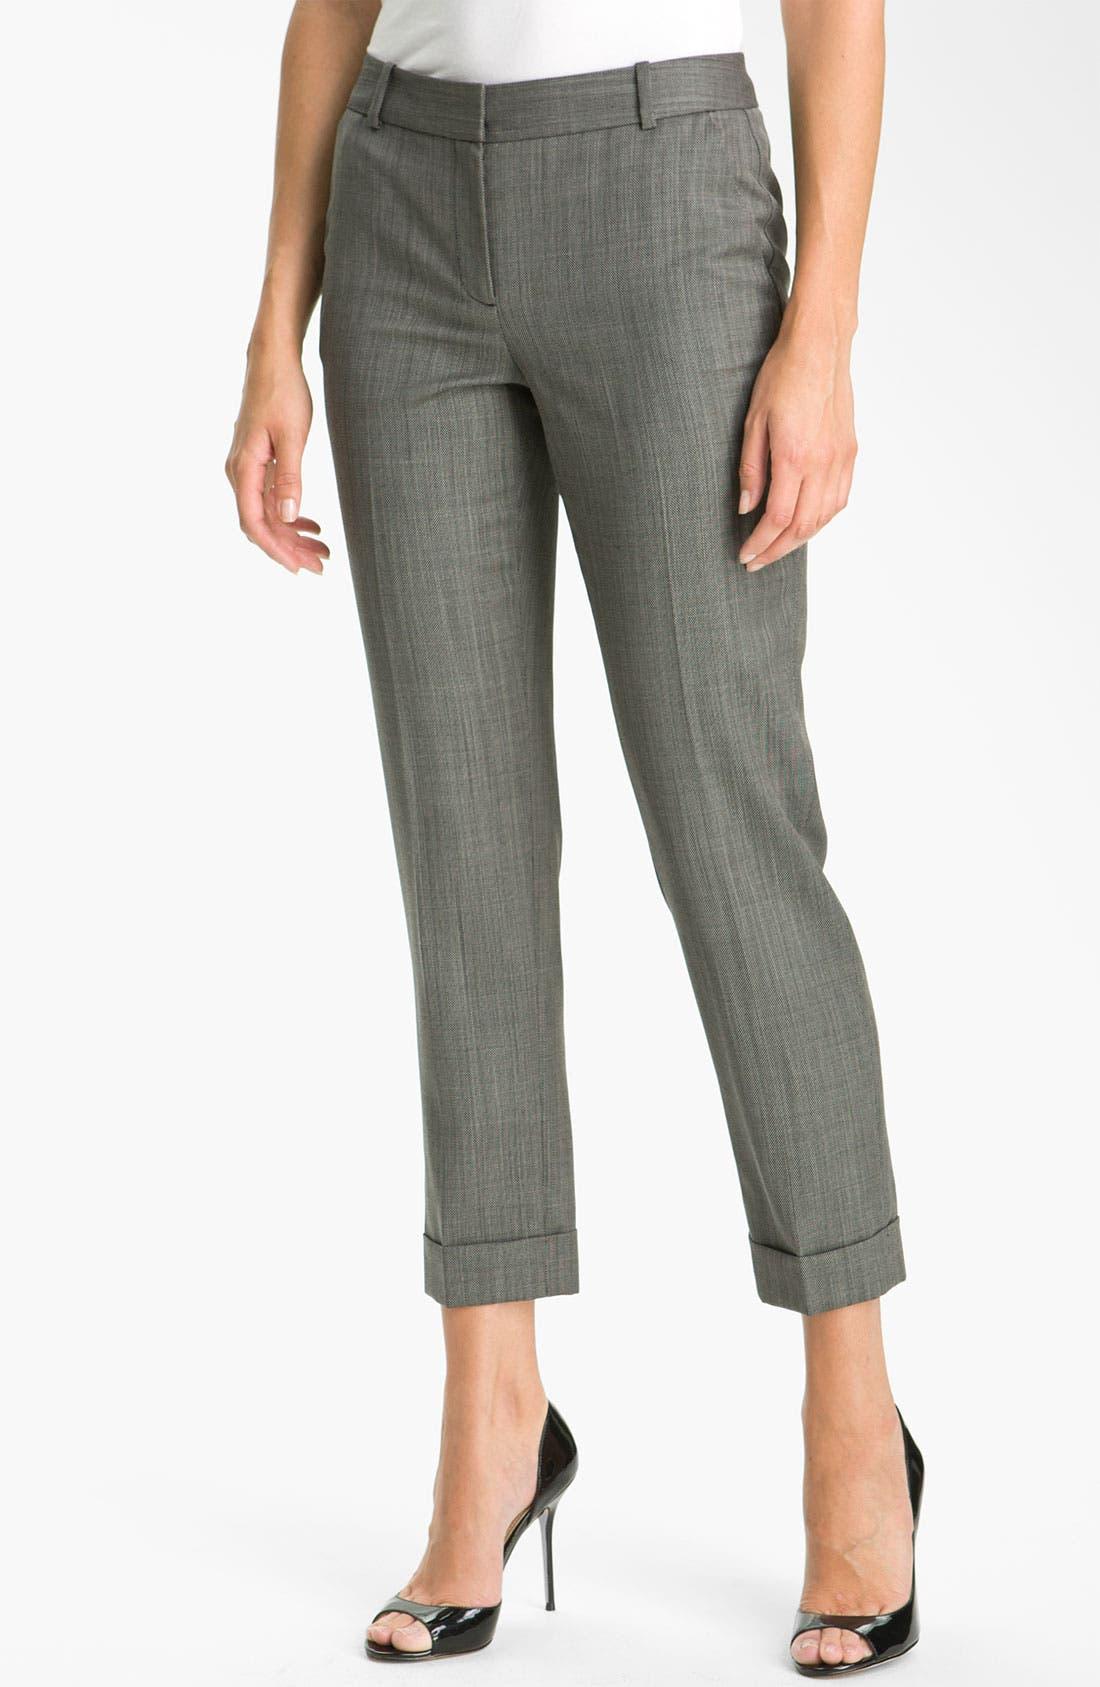 Alternate Image 1 Selected - Classiques Entier® 'Minuet' Textured Ankle Pants